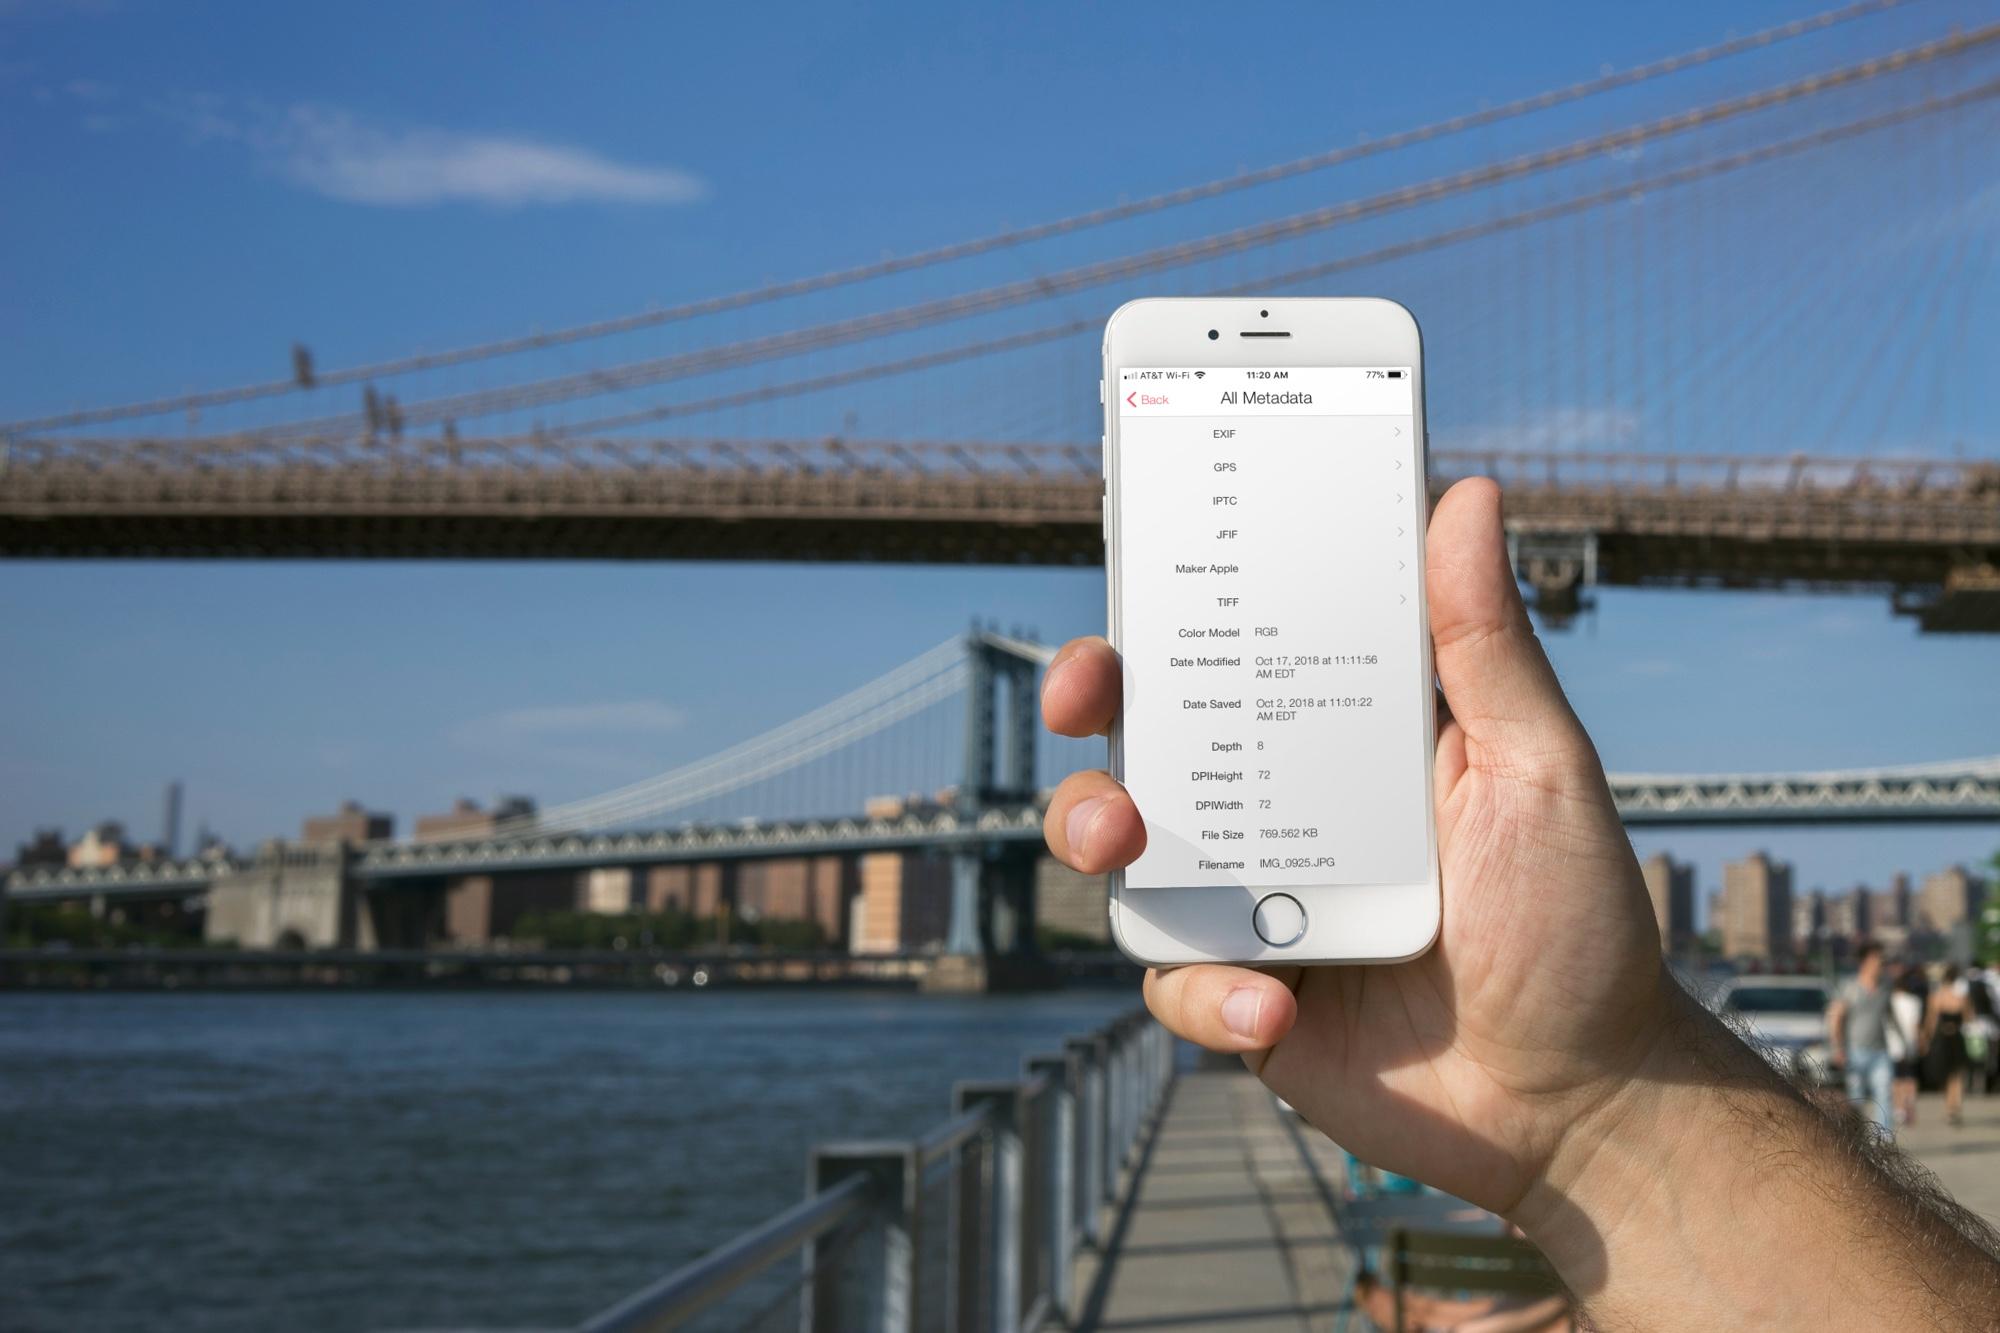 Photo Investigator All Metadata on iPhone